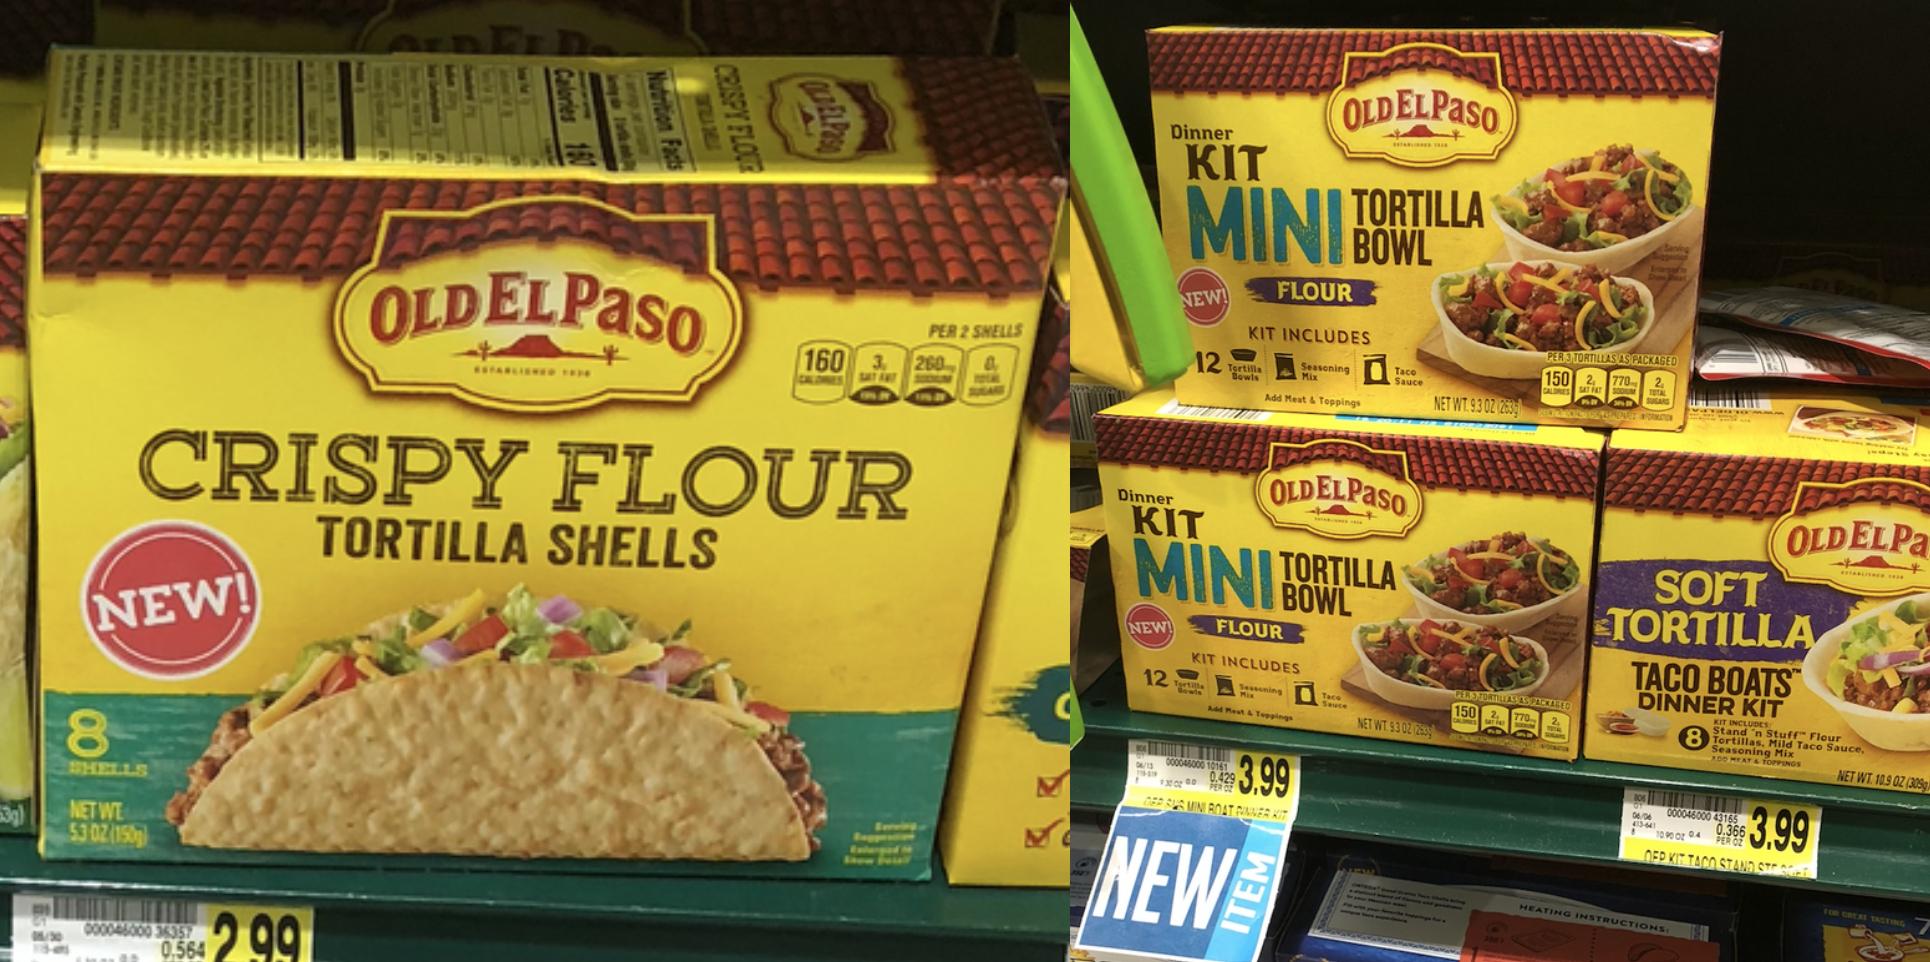 New Old El Paso Coupons - Moola Saving Mom - Free Printable Old El Paso Coupons